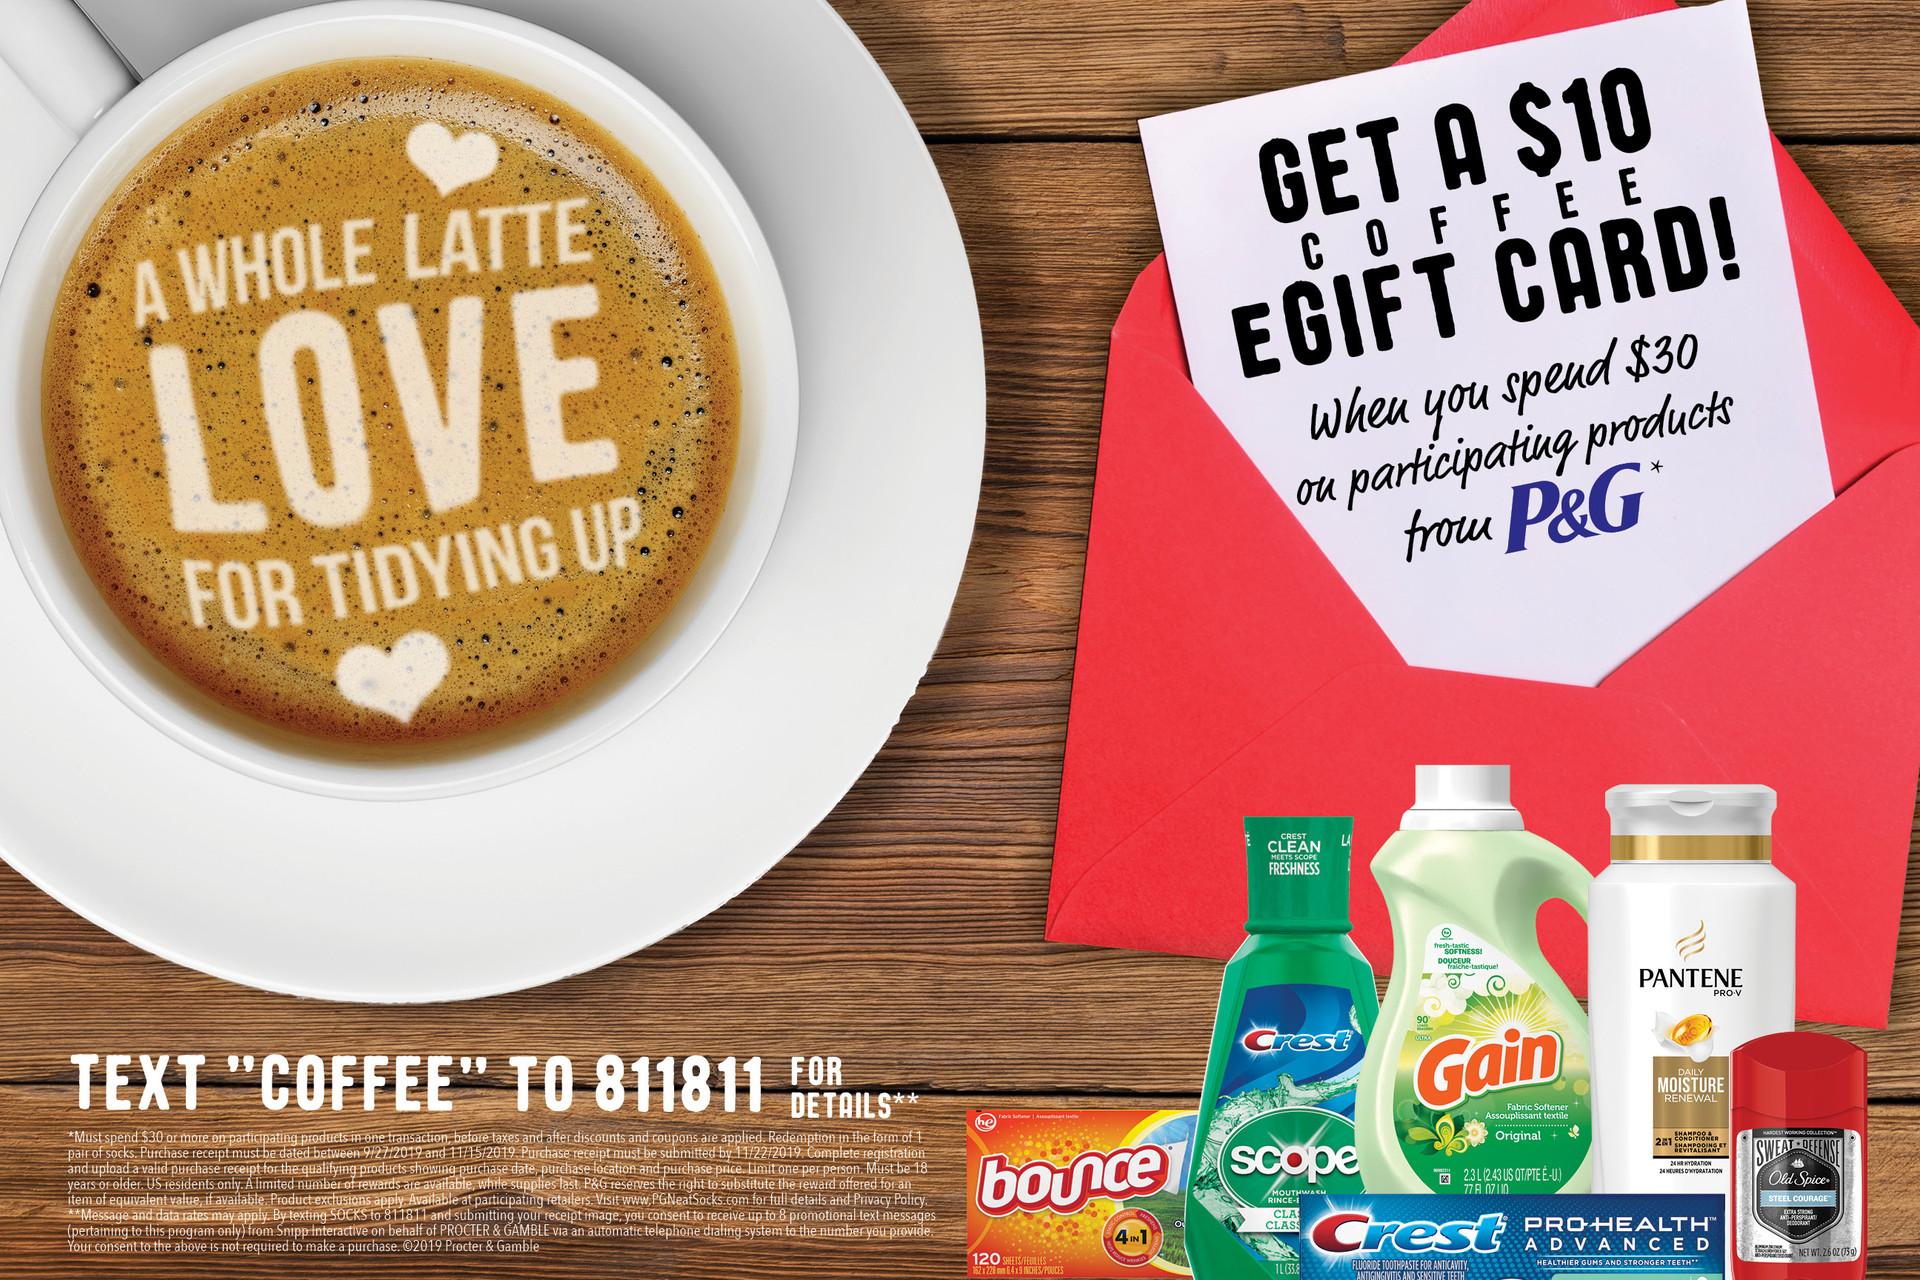 19-PG-455-001-JFM Valentines Coffee-V2.j